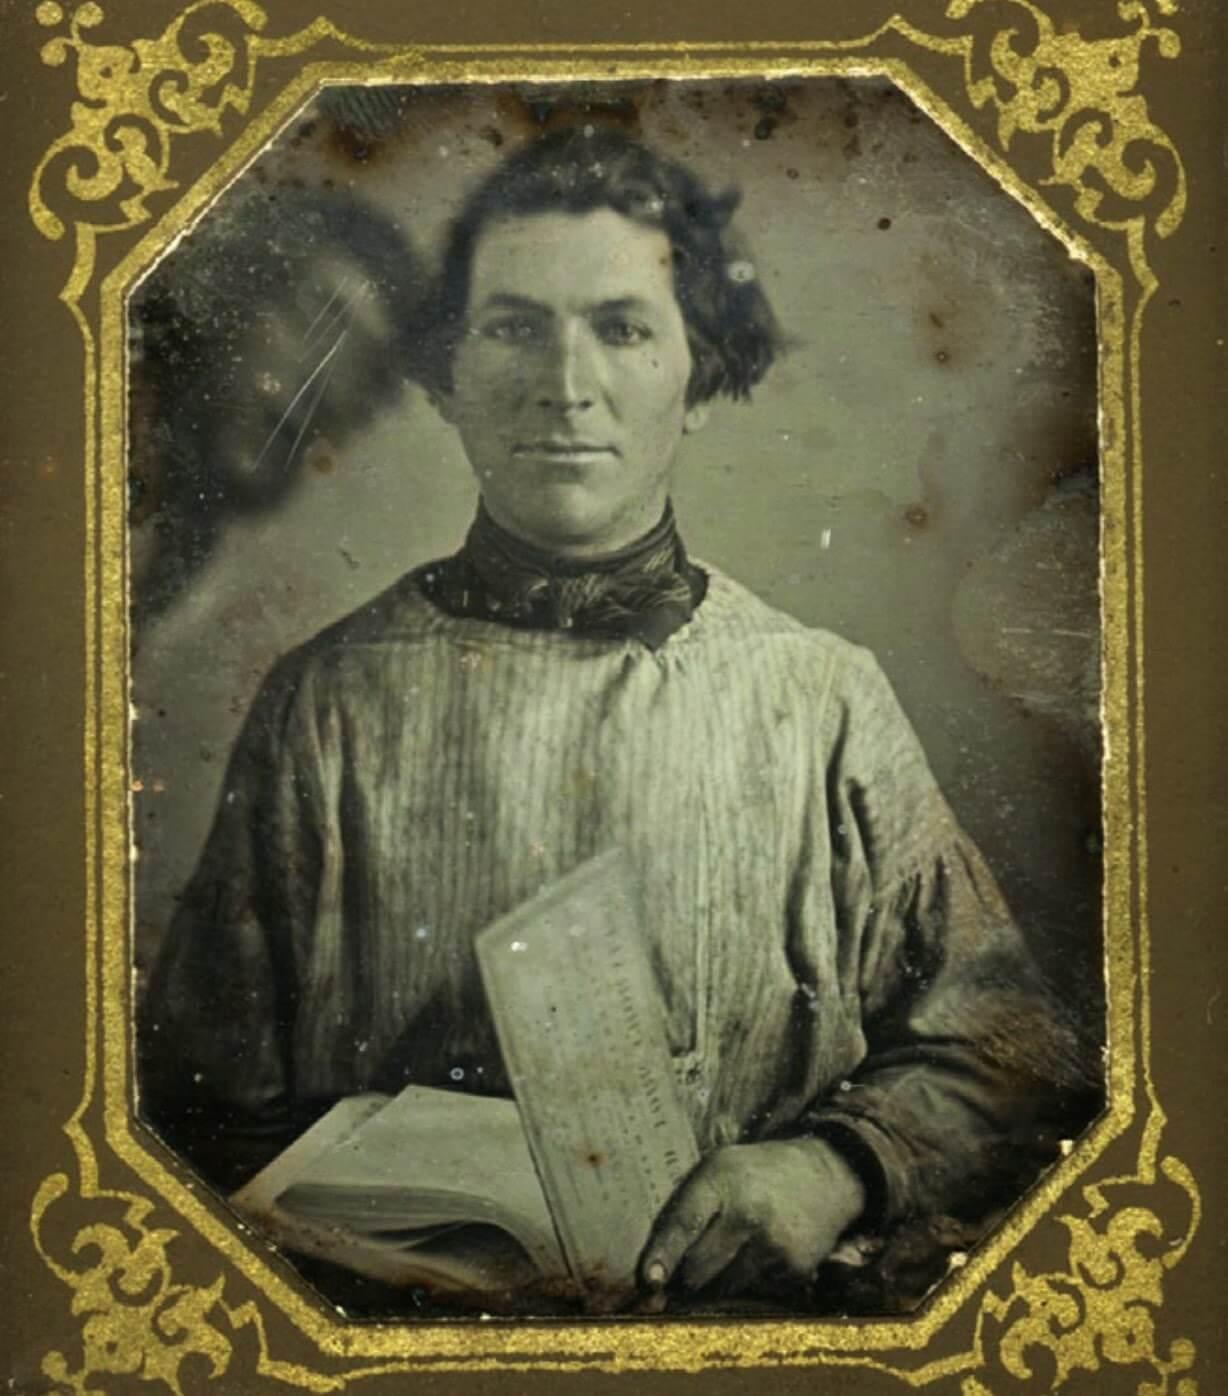 Anonymous daguerreotype portrait, c.1840s